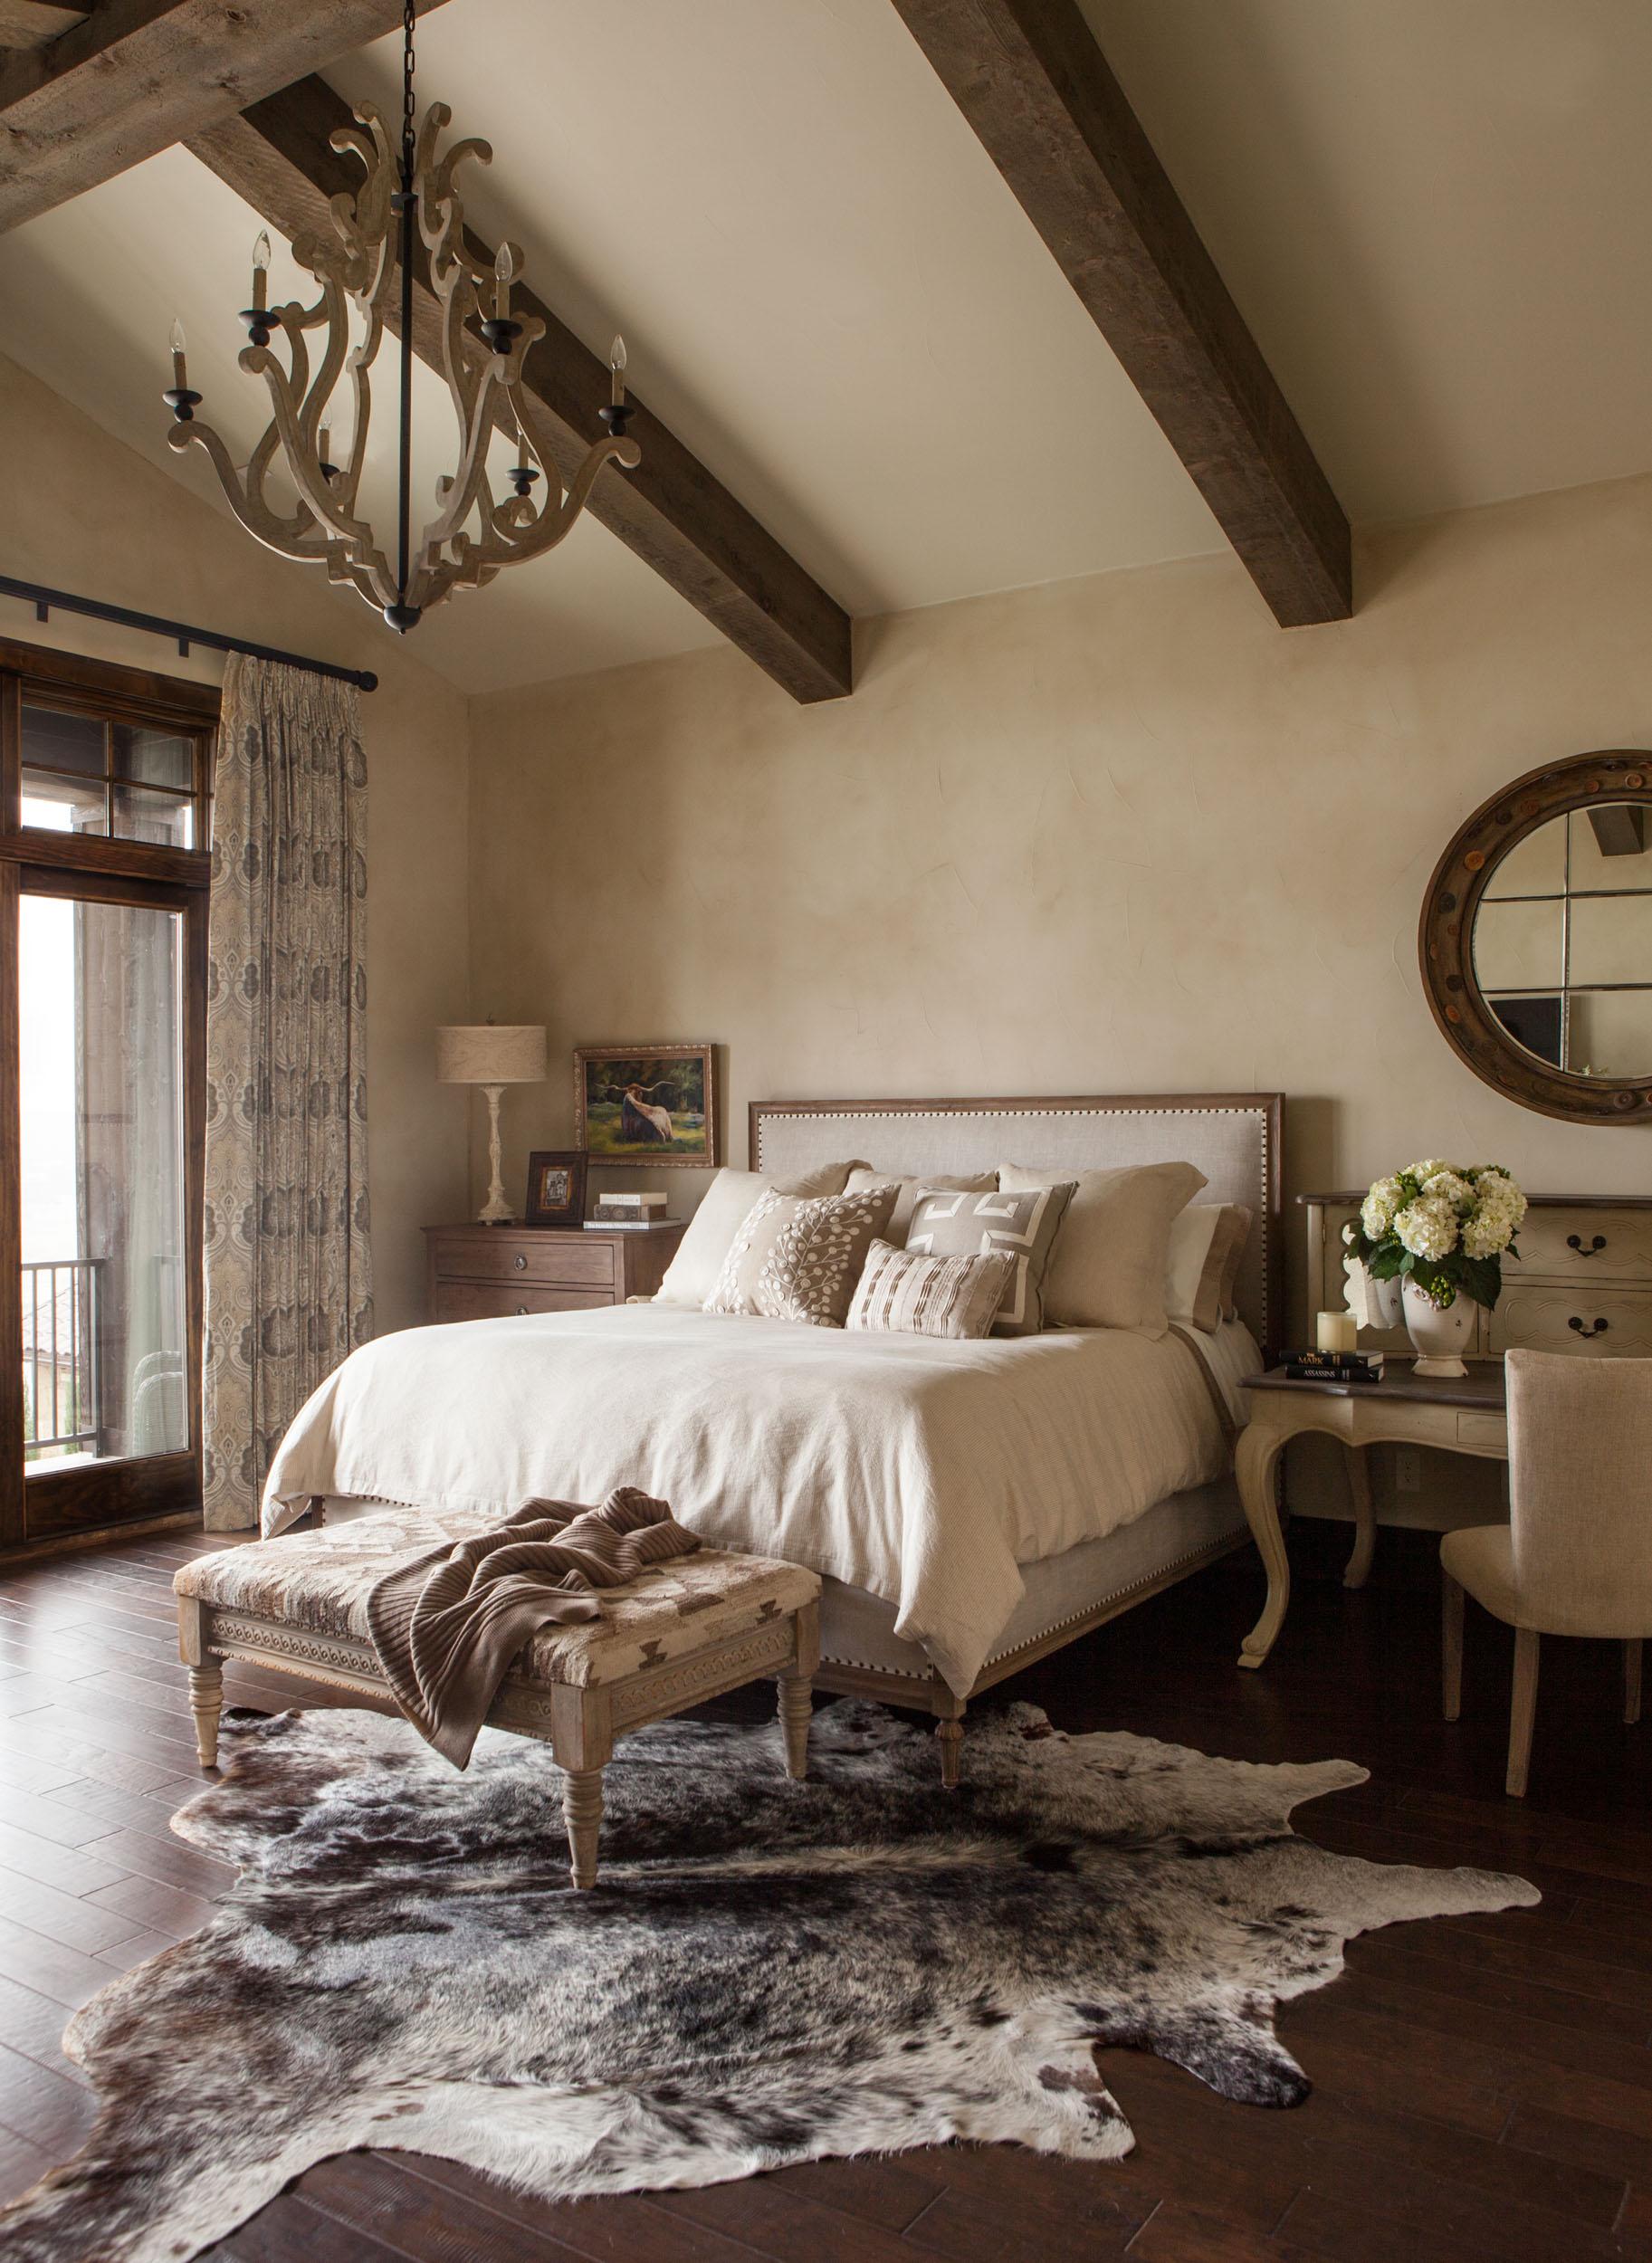 austin-house-bedroom-bed-interior-design.jpg